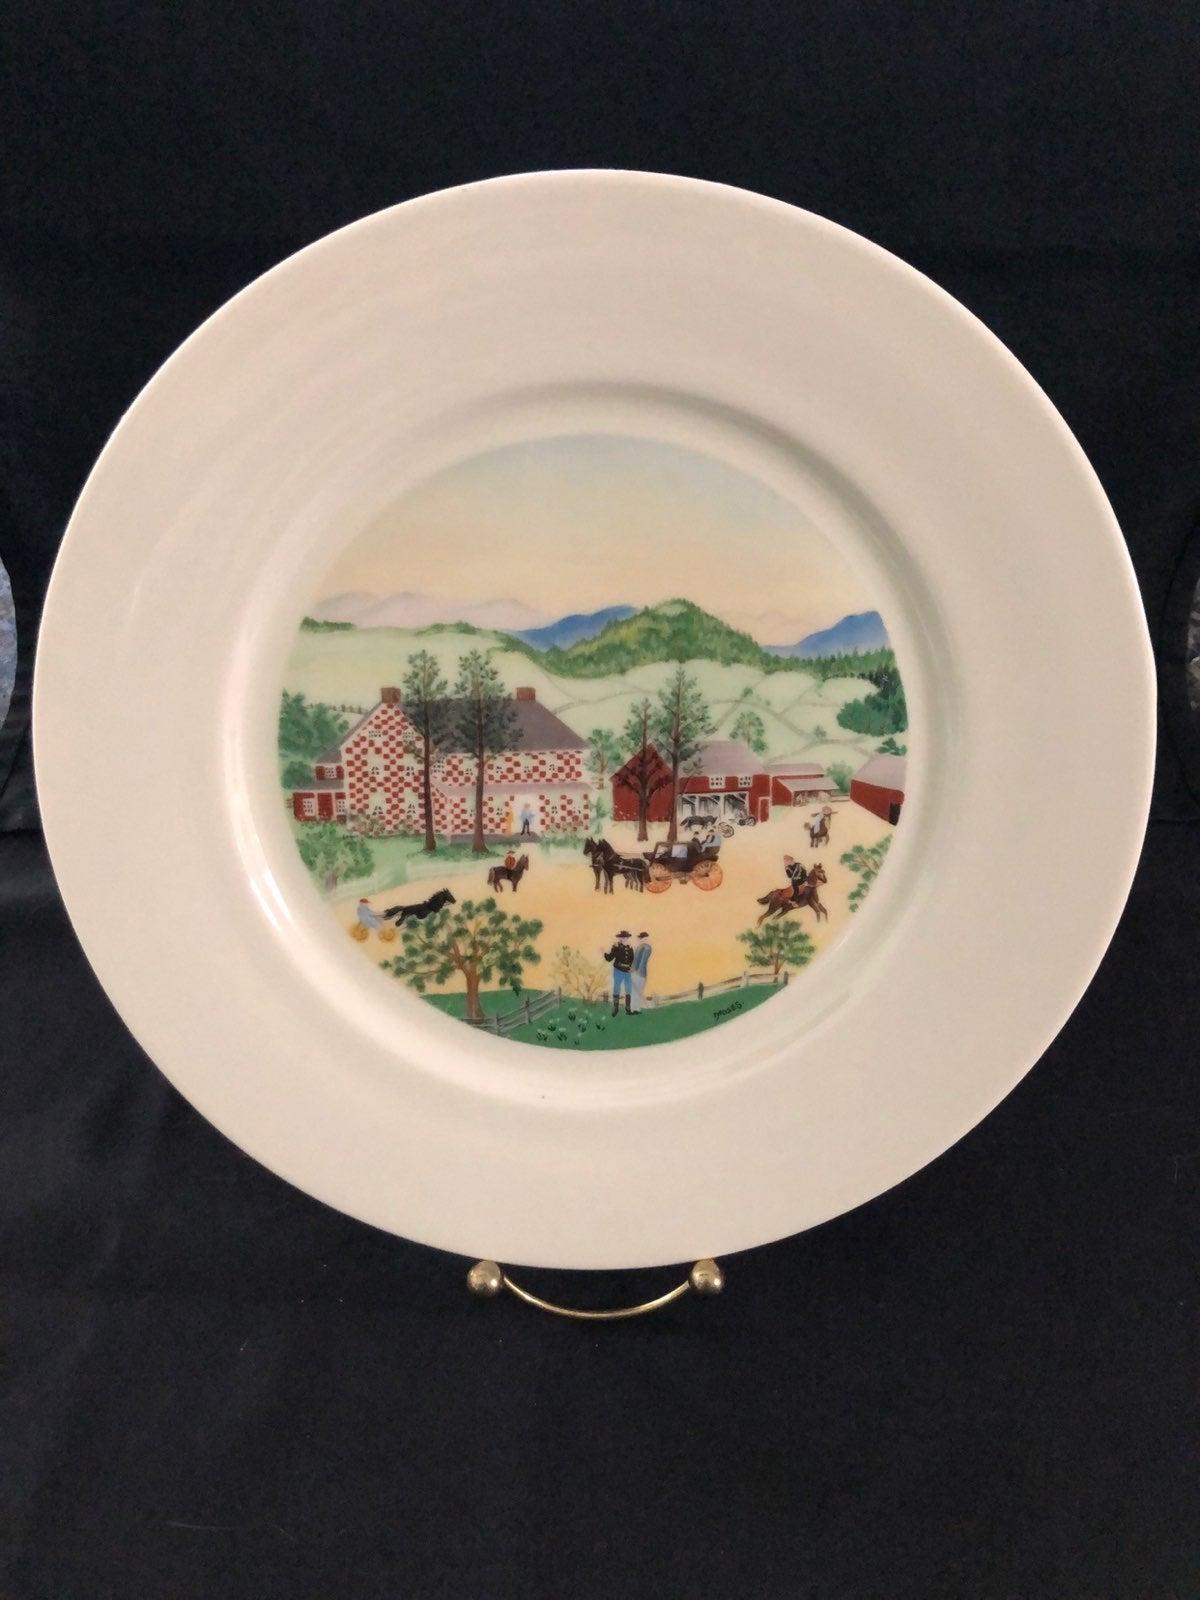 Vntg Grandma Moses Plate